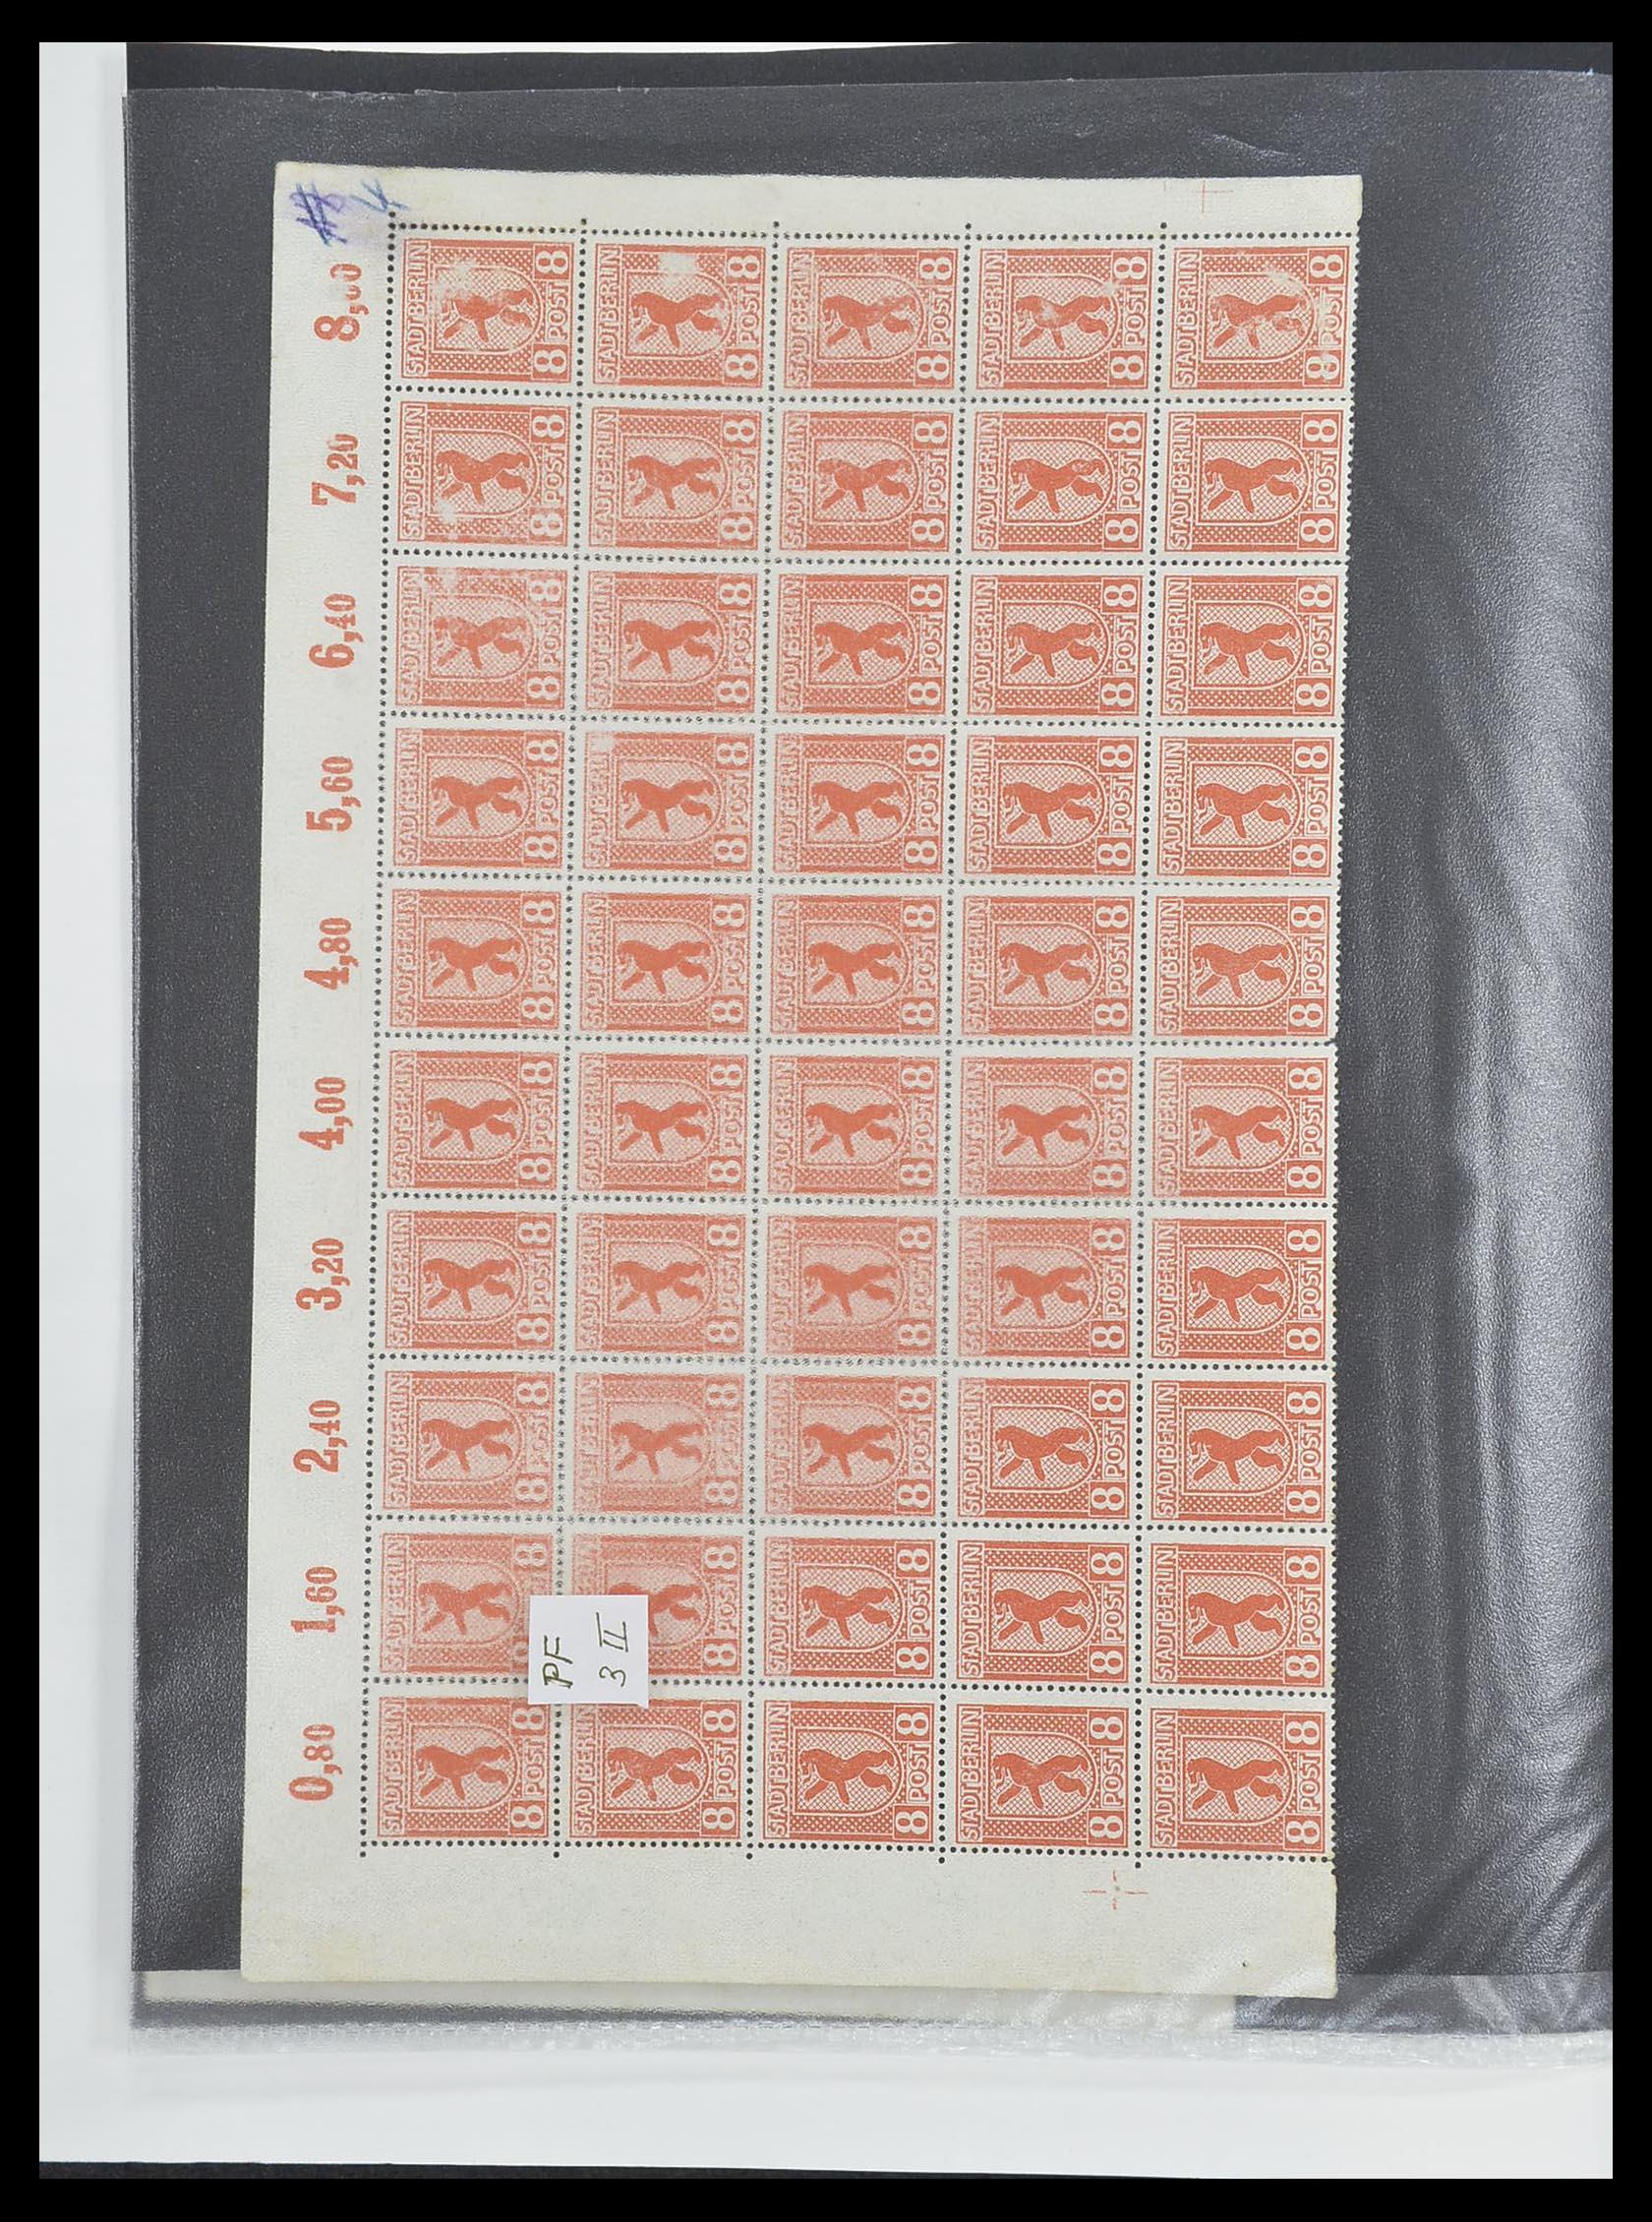 33698 006 - Postzegelverzameling 33698 Sovjet Zone 1945-1948.